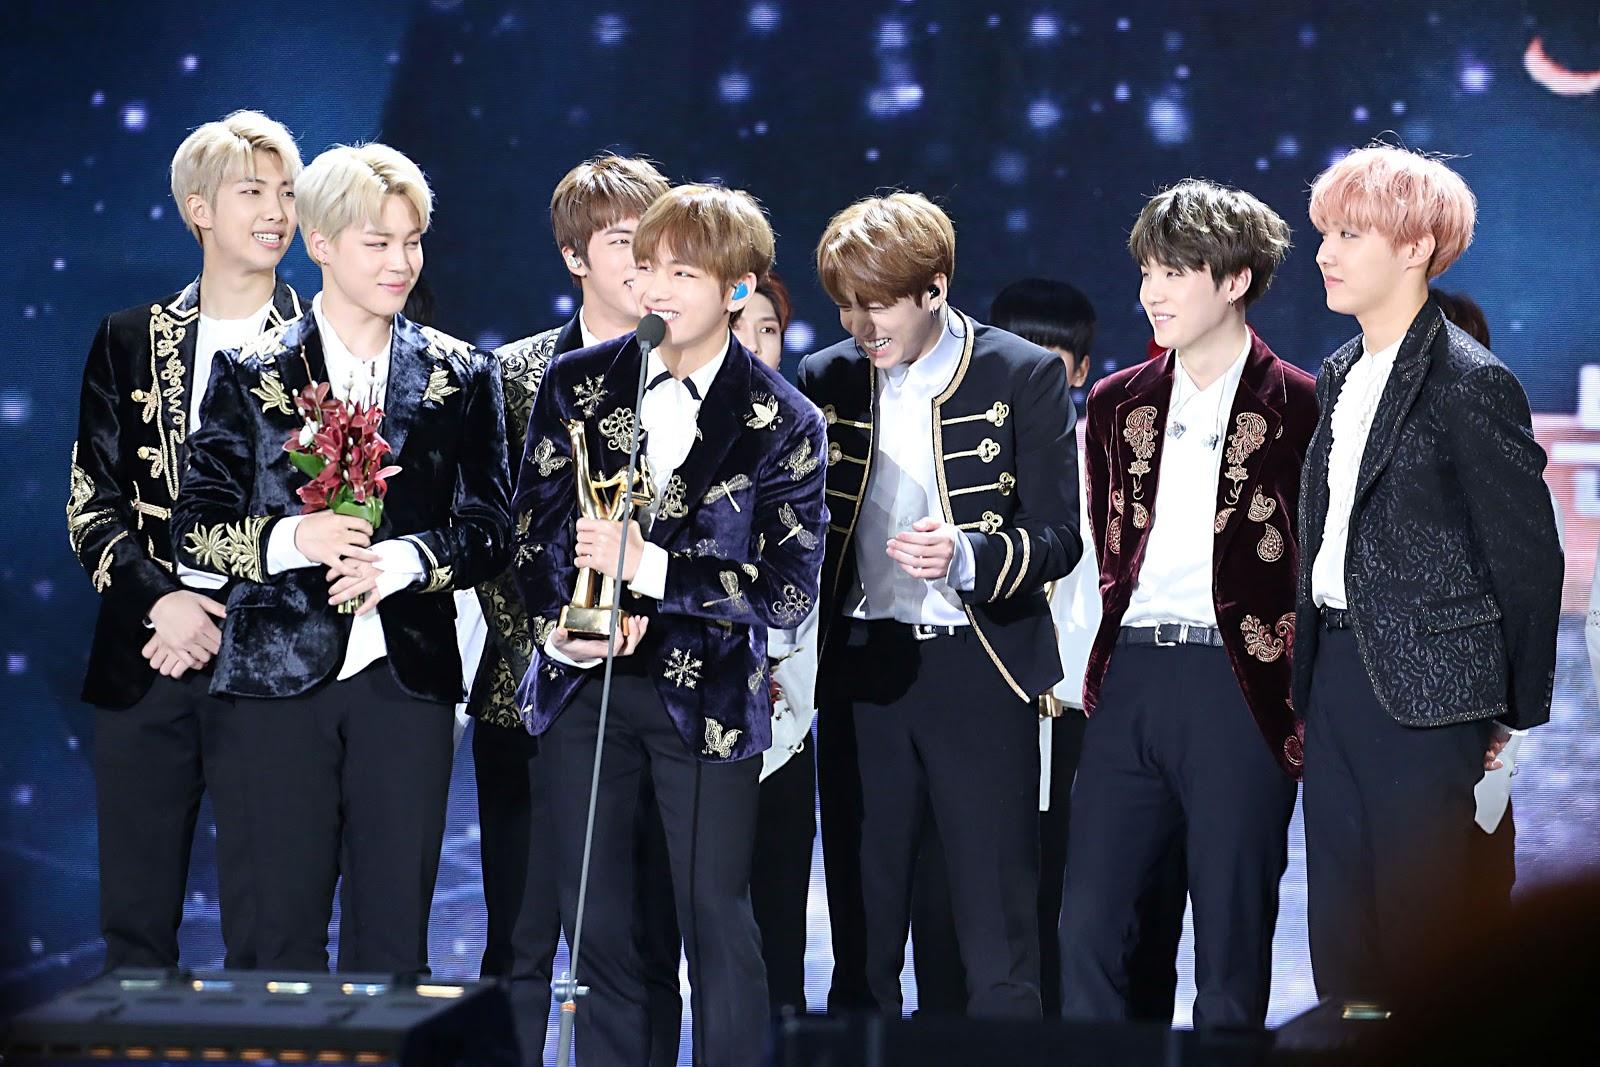 BTS at the 31st Golden Disk Awards